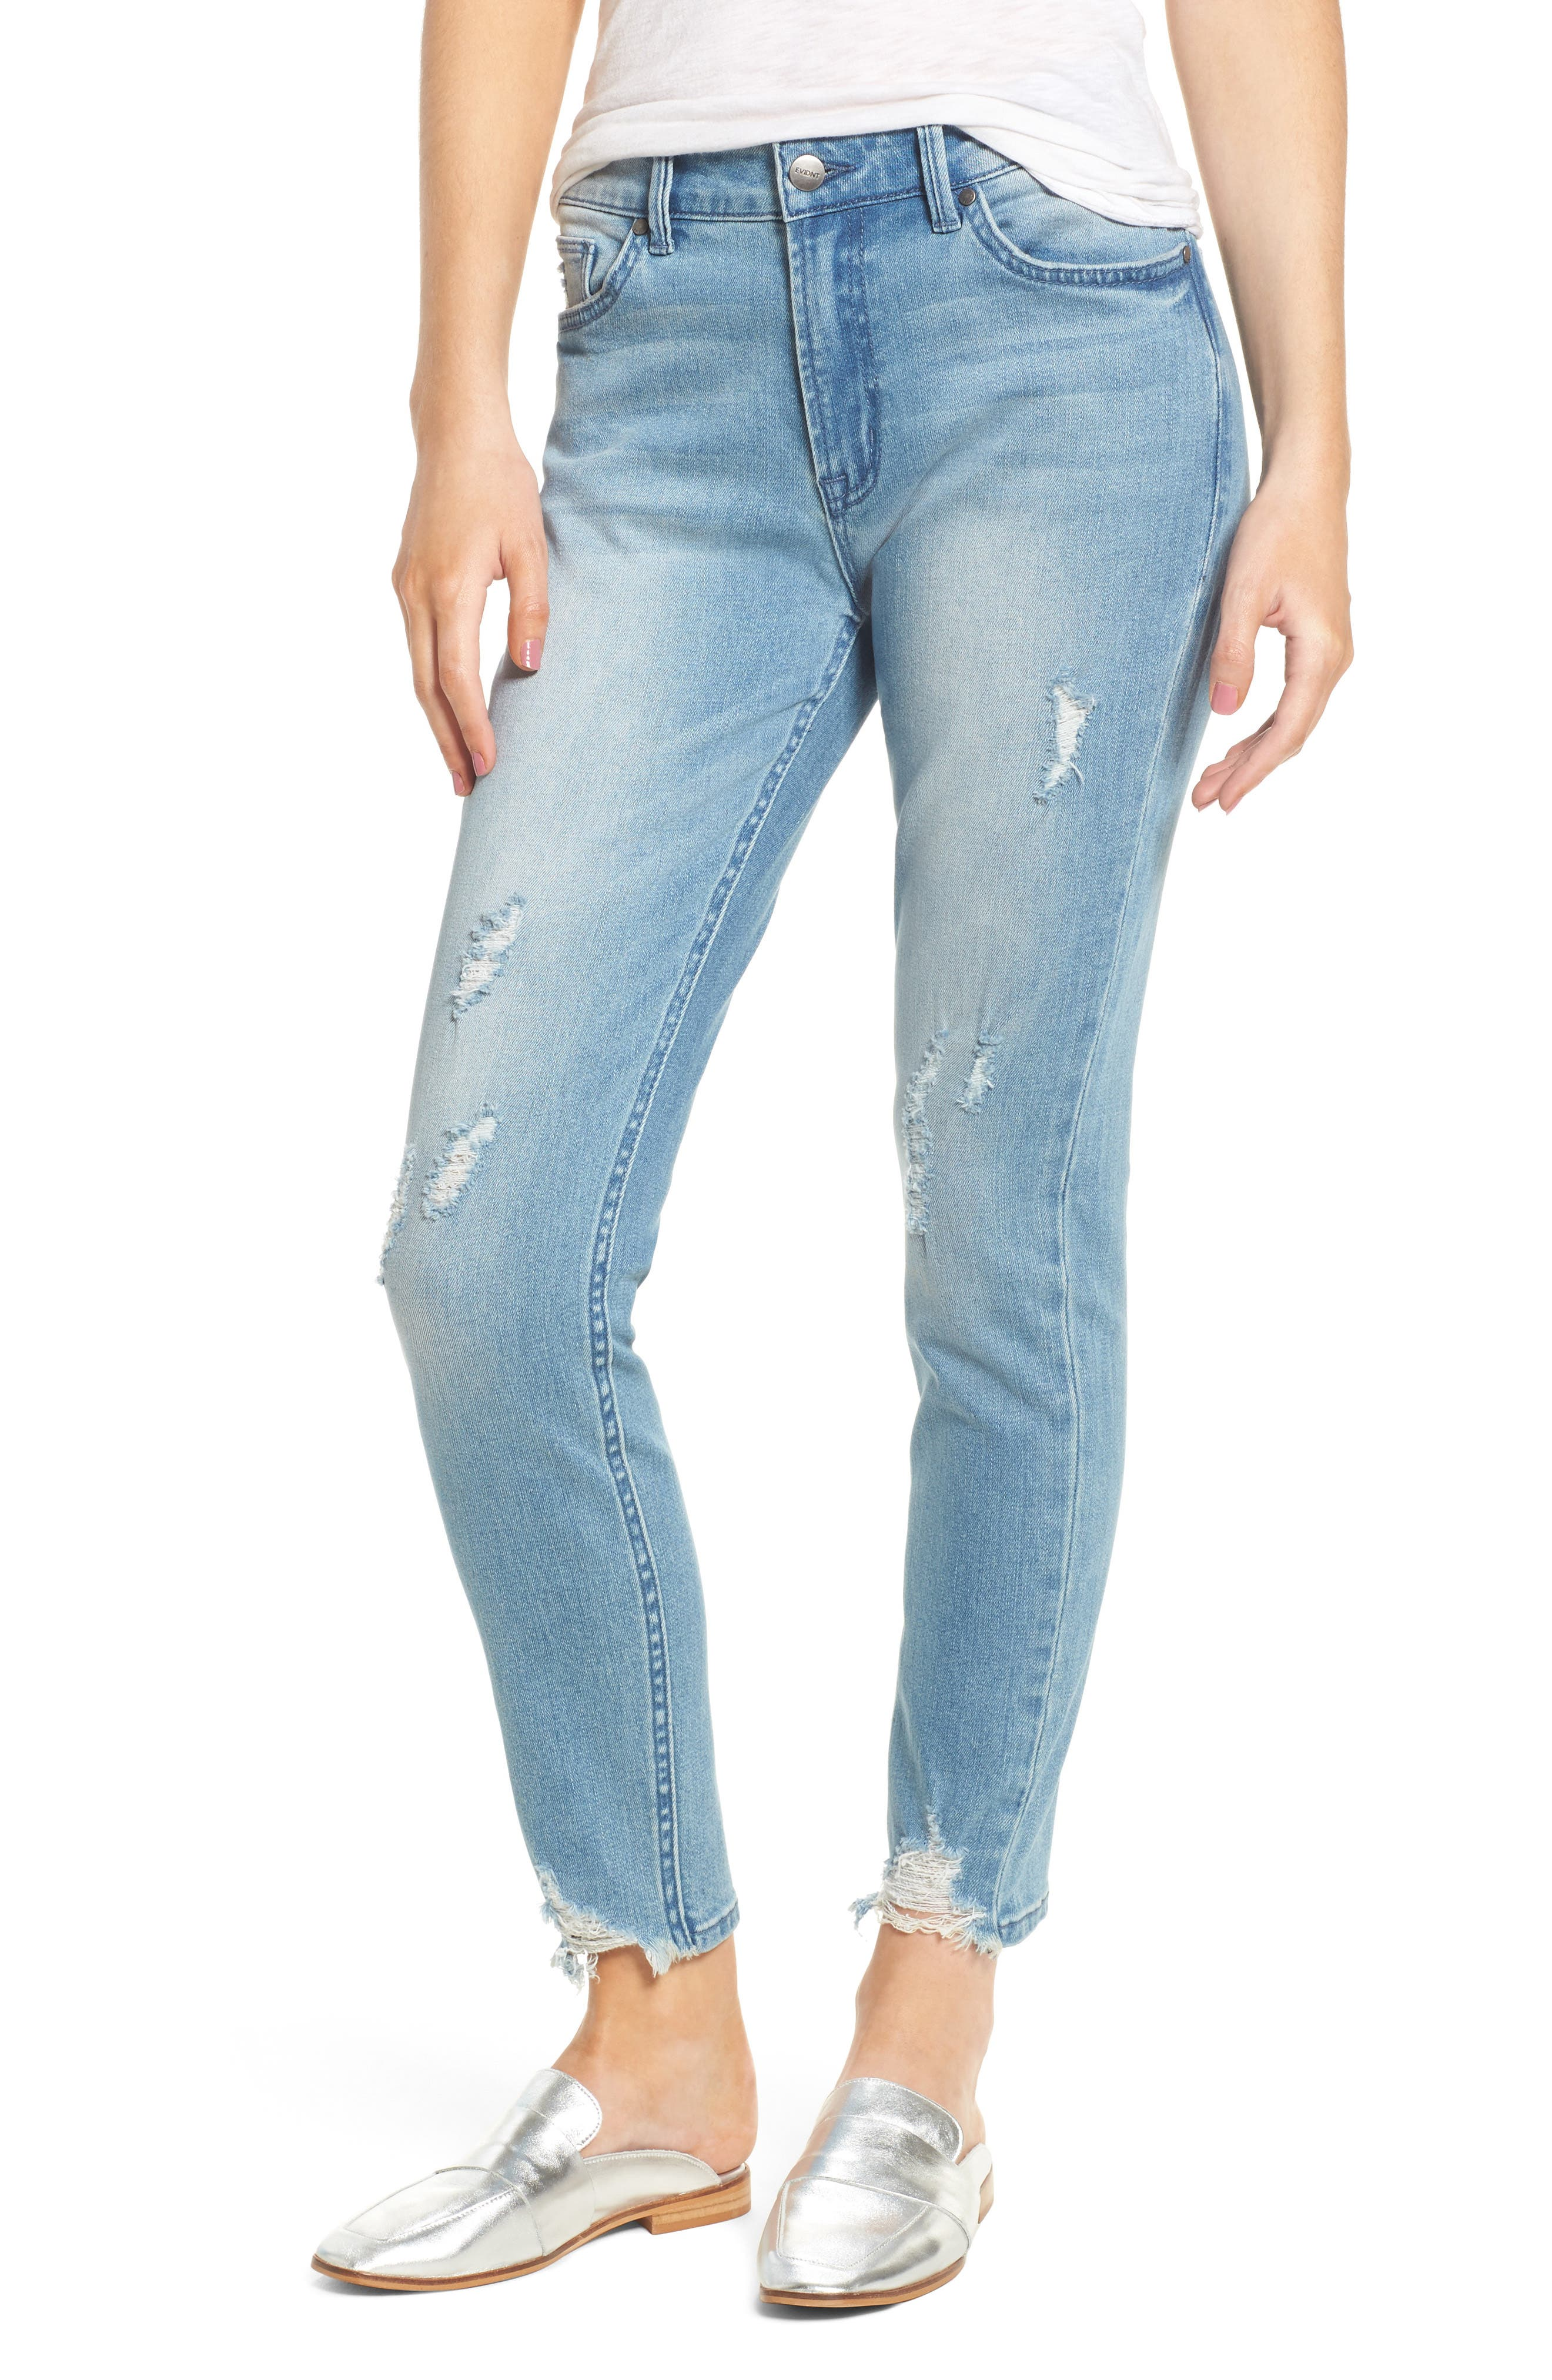 Verona Skinny Jeans,                         Main,                         color, 403